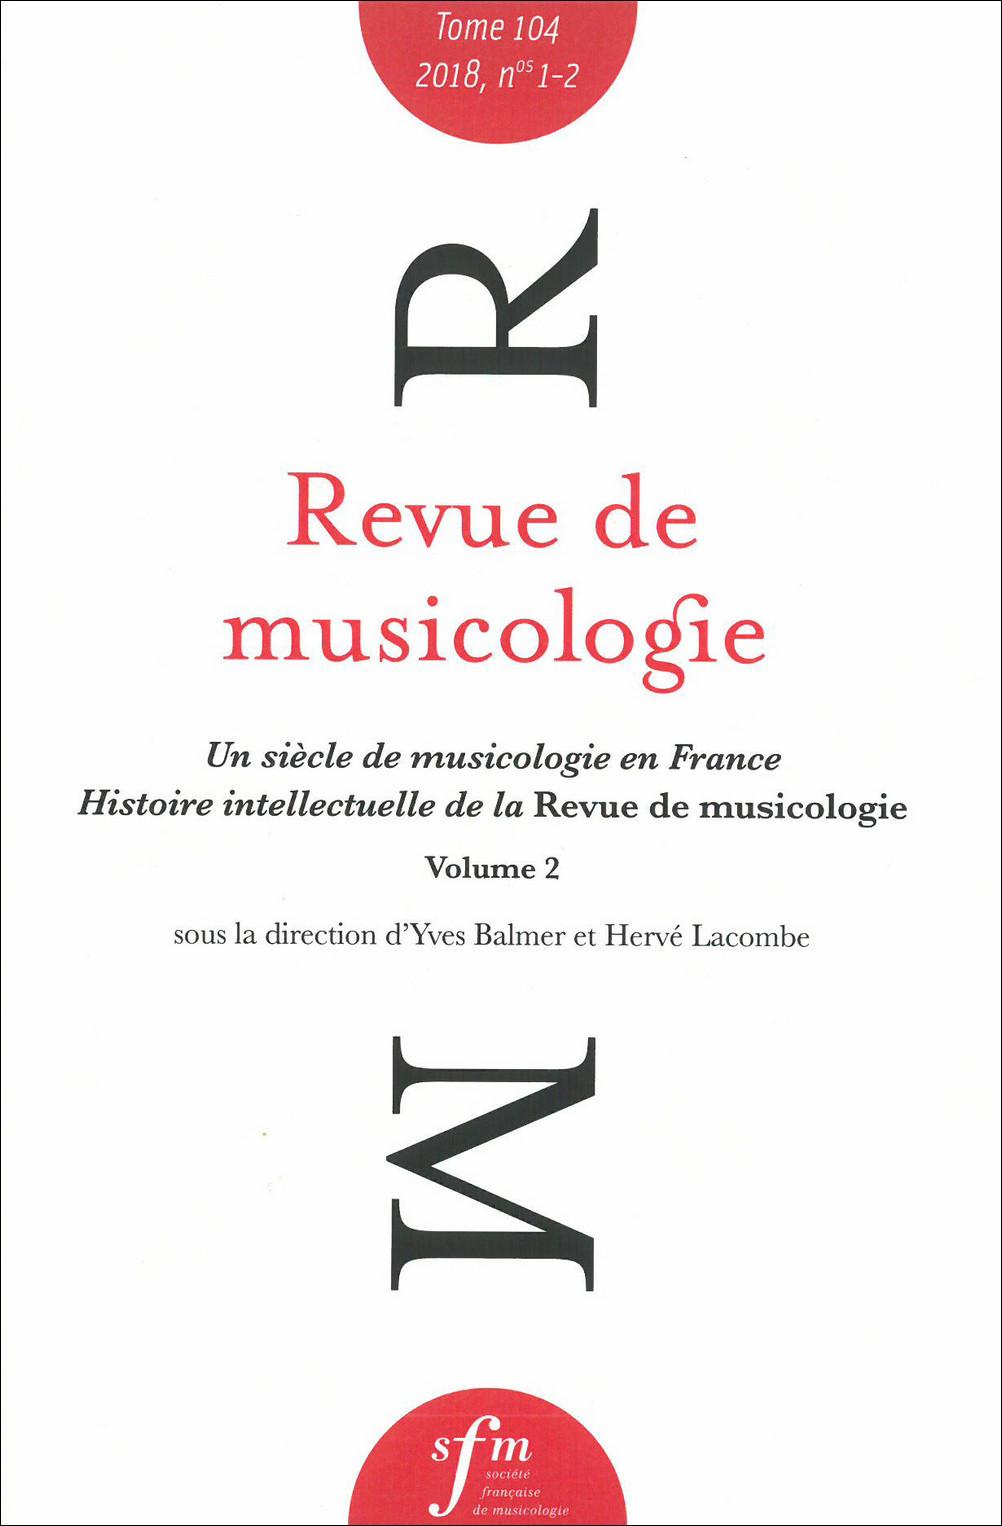 REVUE DE MUSICOLOGIE TOME 104, N  1-2 (2018)